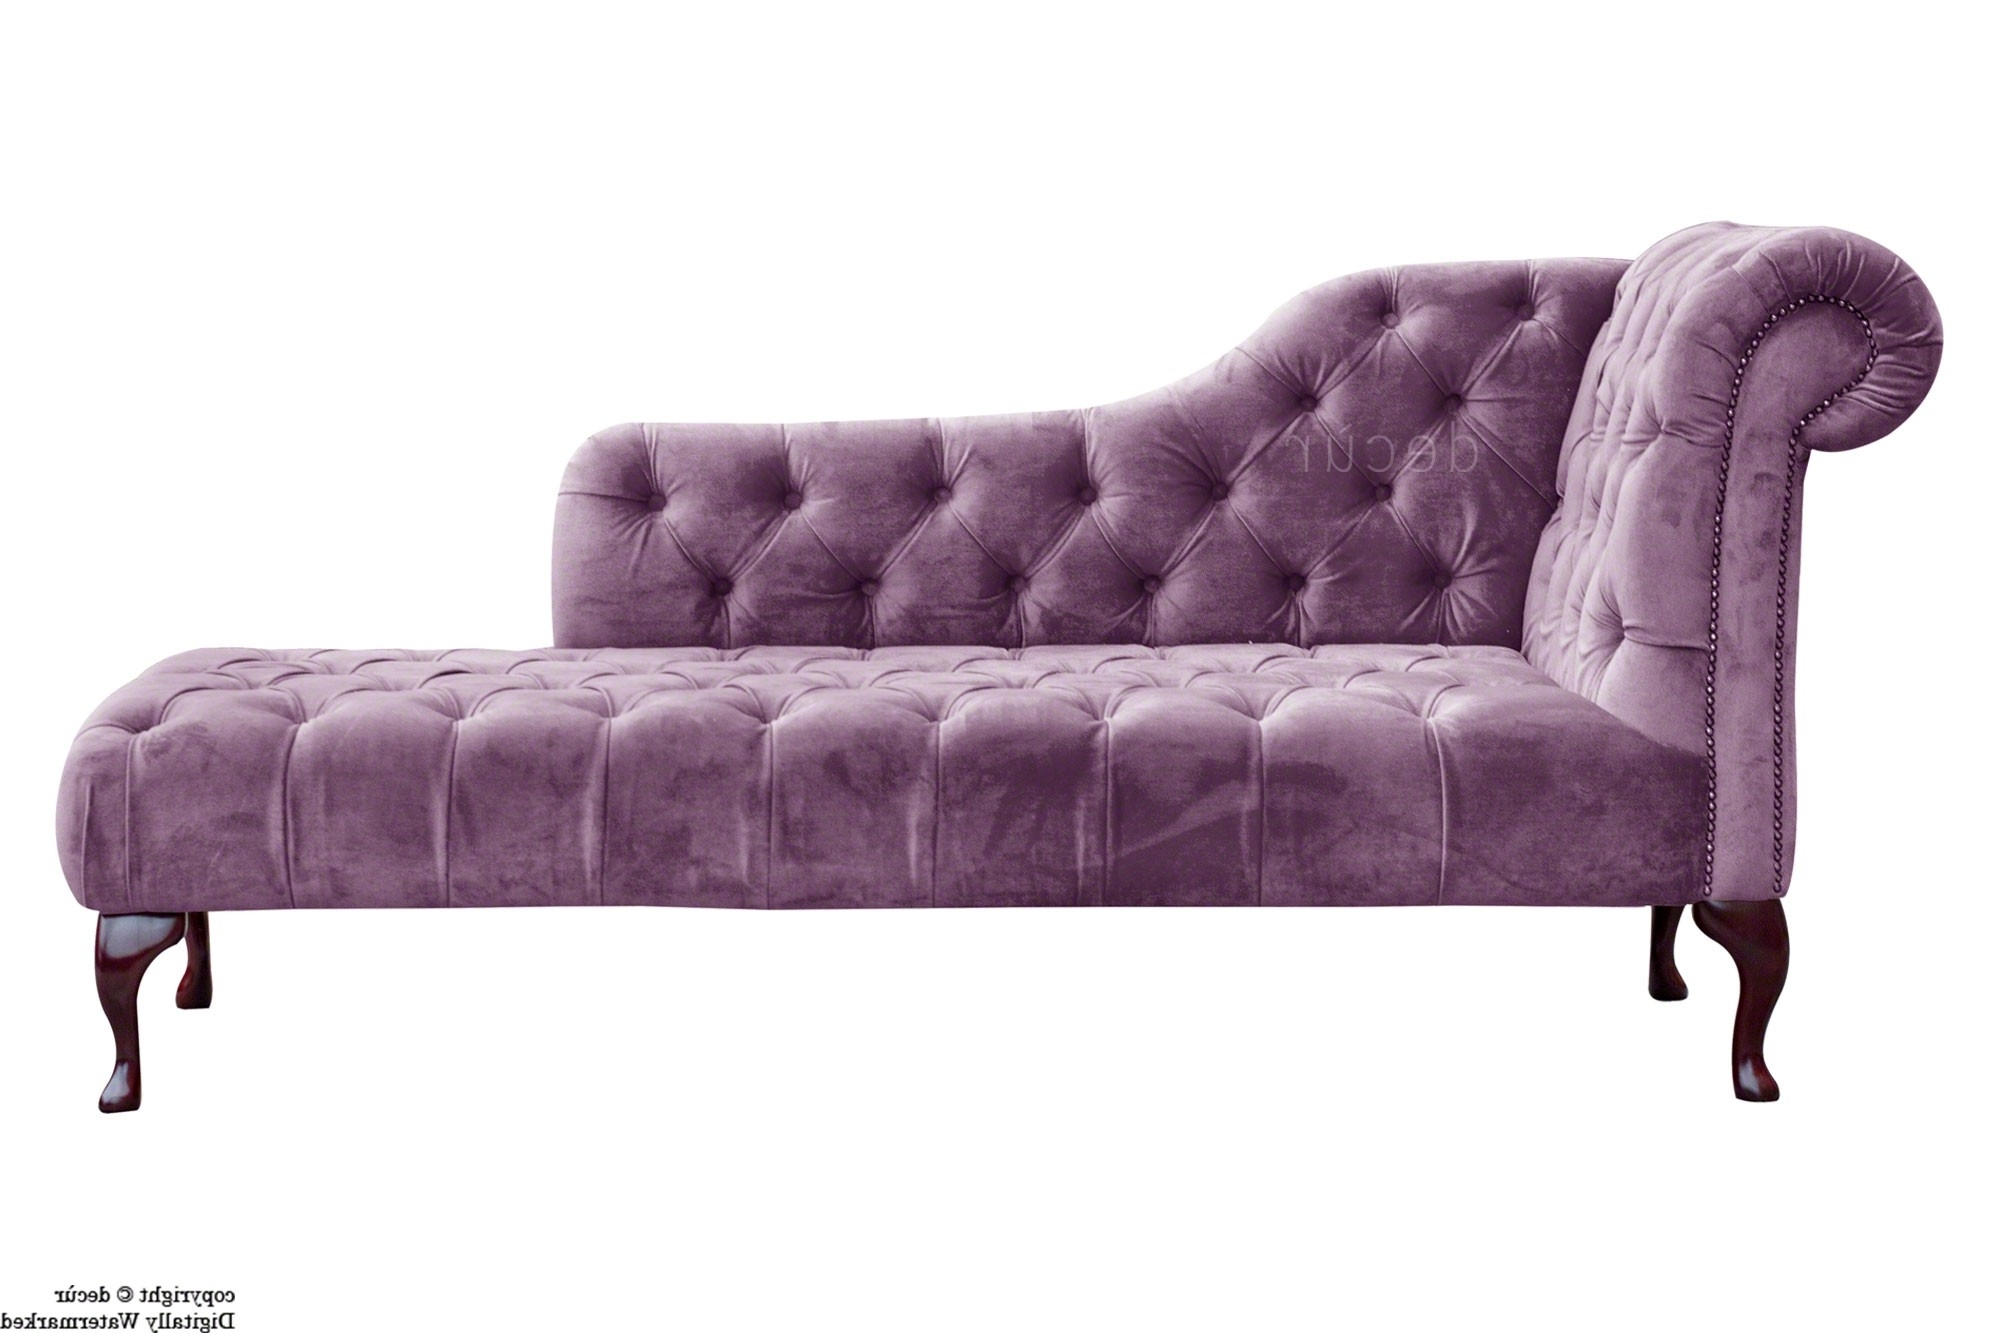 Stunning Purple Chaise Longue Ideas – Joshkrajcik – Joshkrajcik Inside Famous Velvet Chaise Lounges (View 8 of 15)